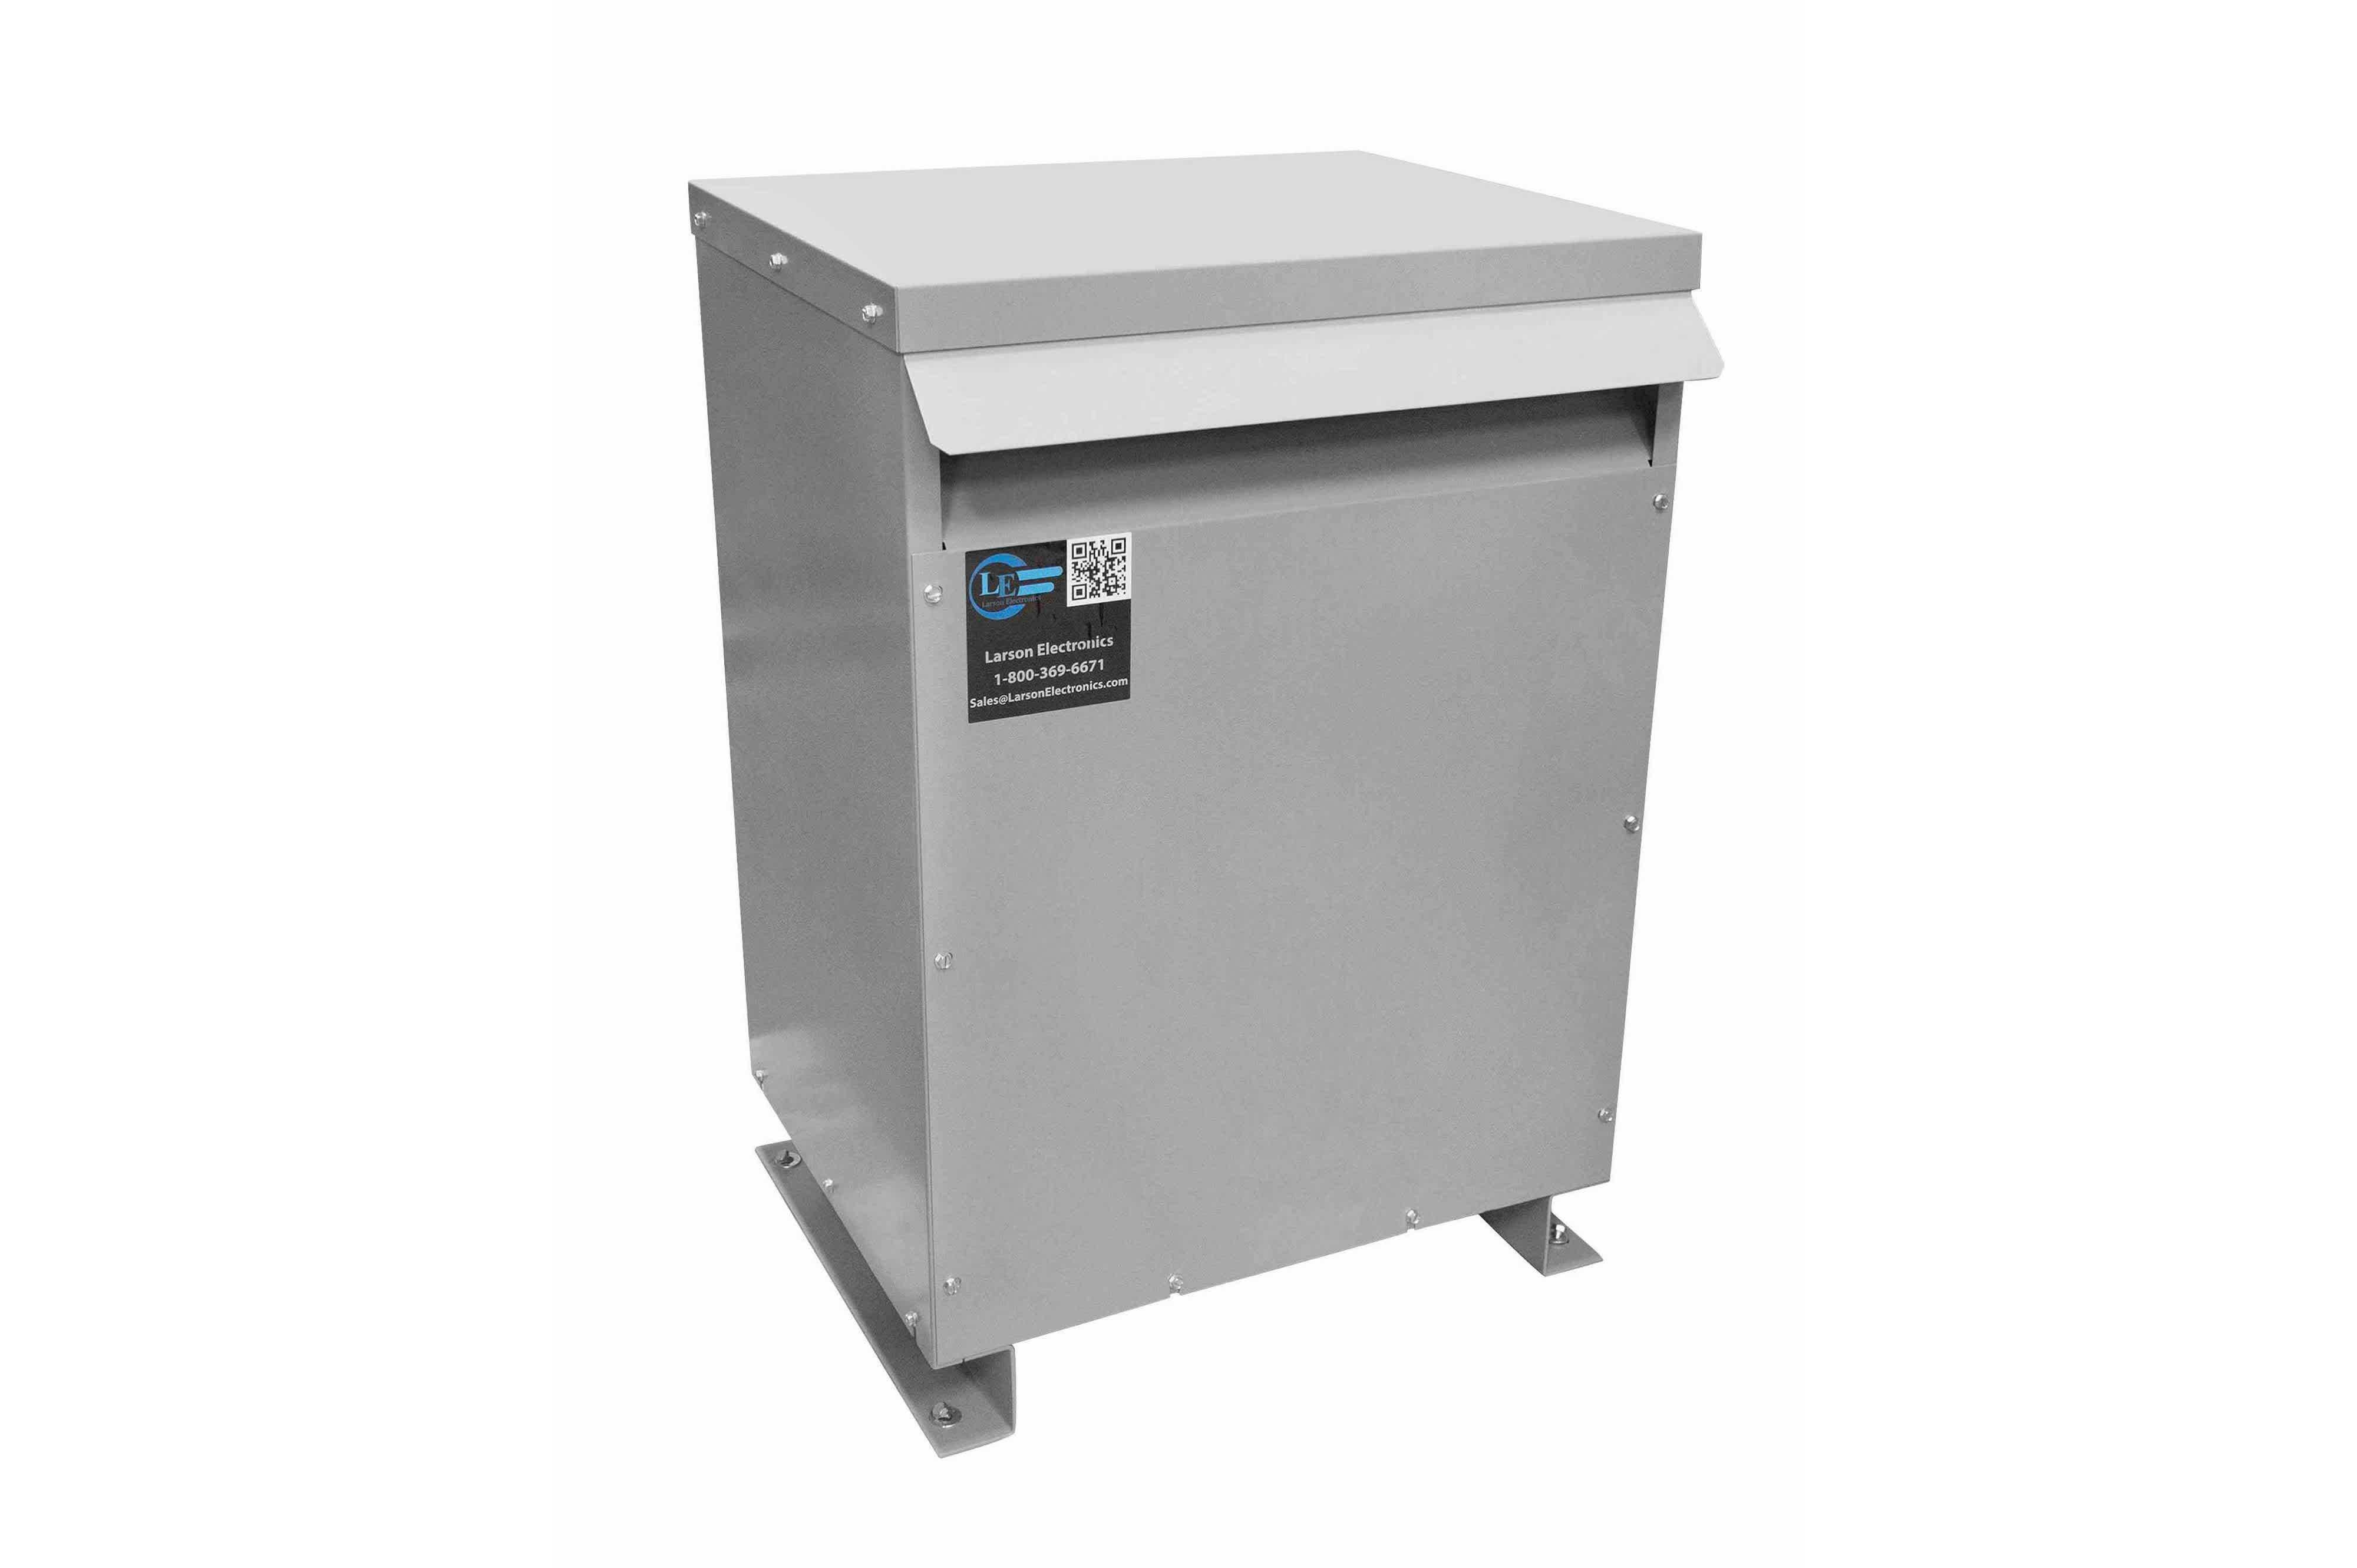 225 kVA 3PH Isolation Transformer, 380V Wye Primary, 240V Delta Secondary, N3R, Ventilated, 60 Hz